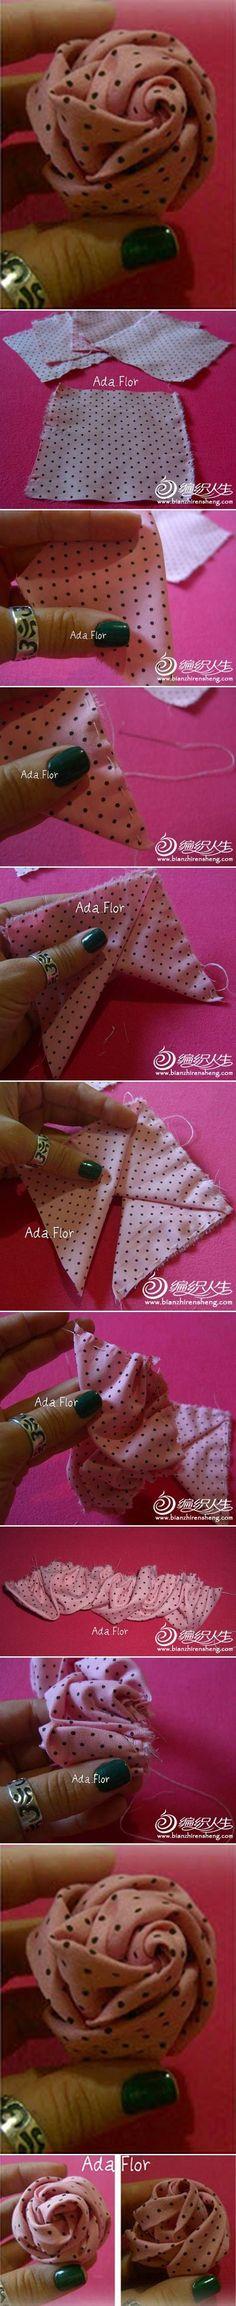 DIY Modular Fabric Rose DIY Modular Fabric Rose